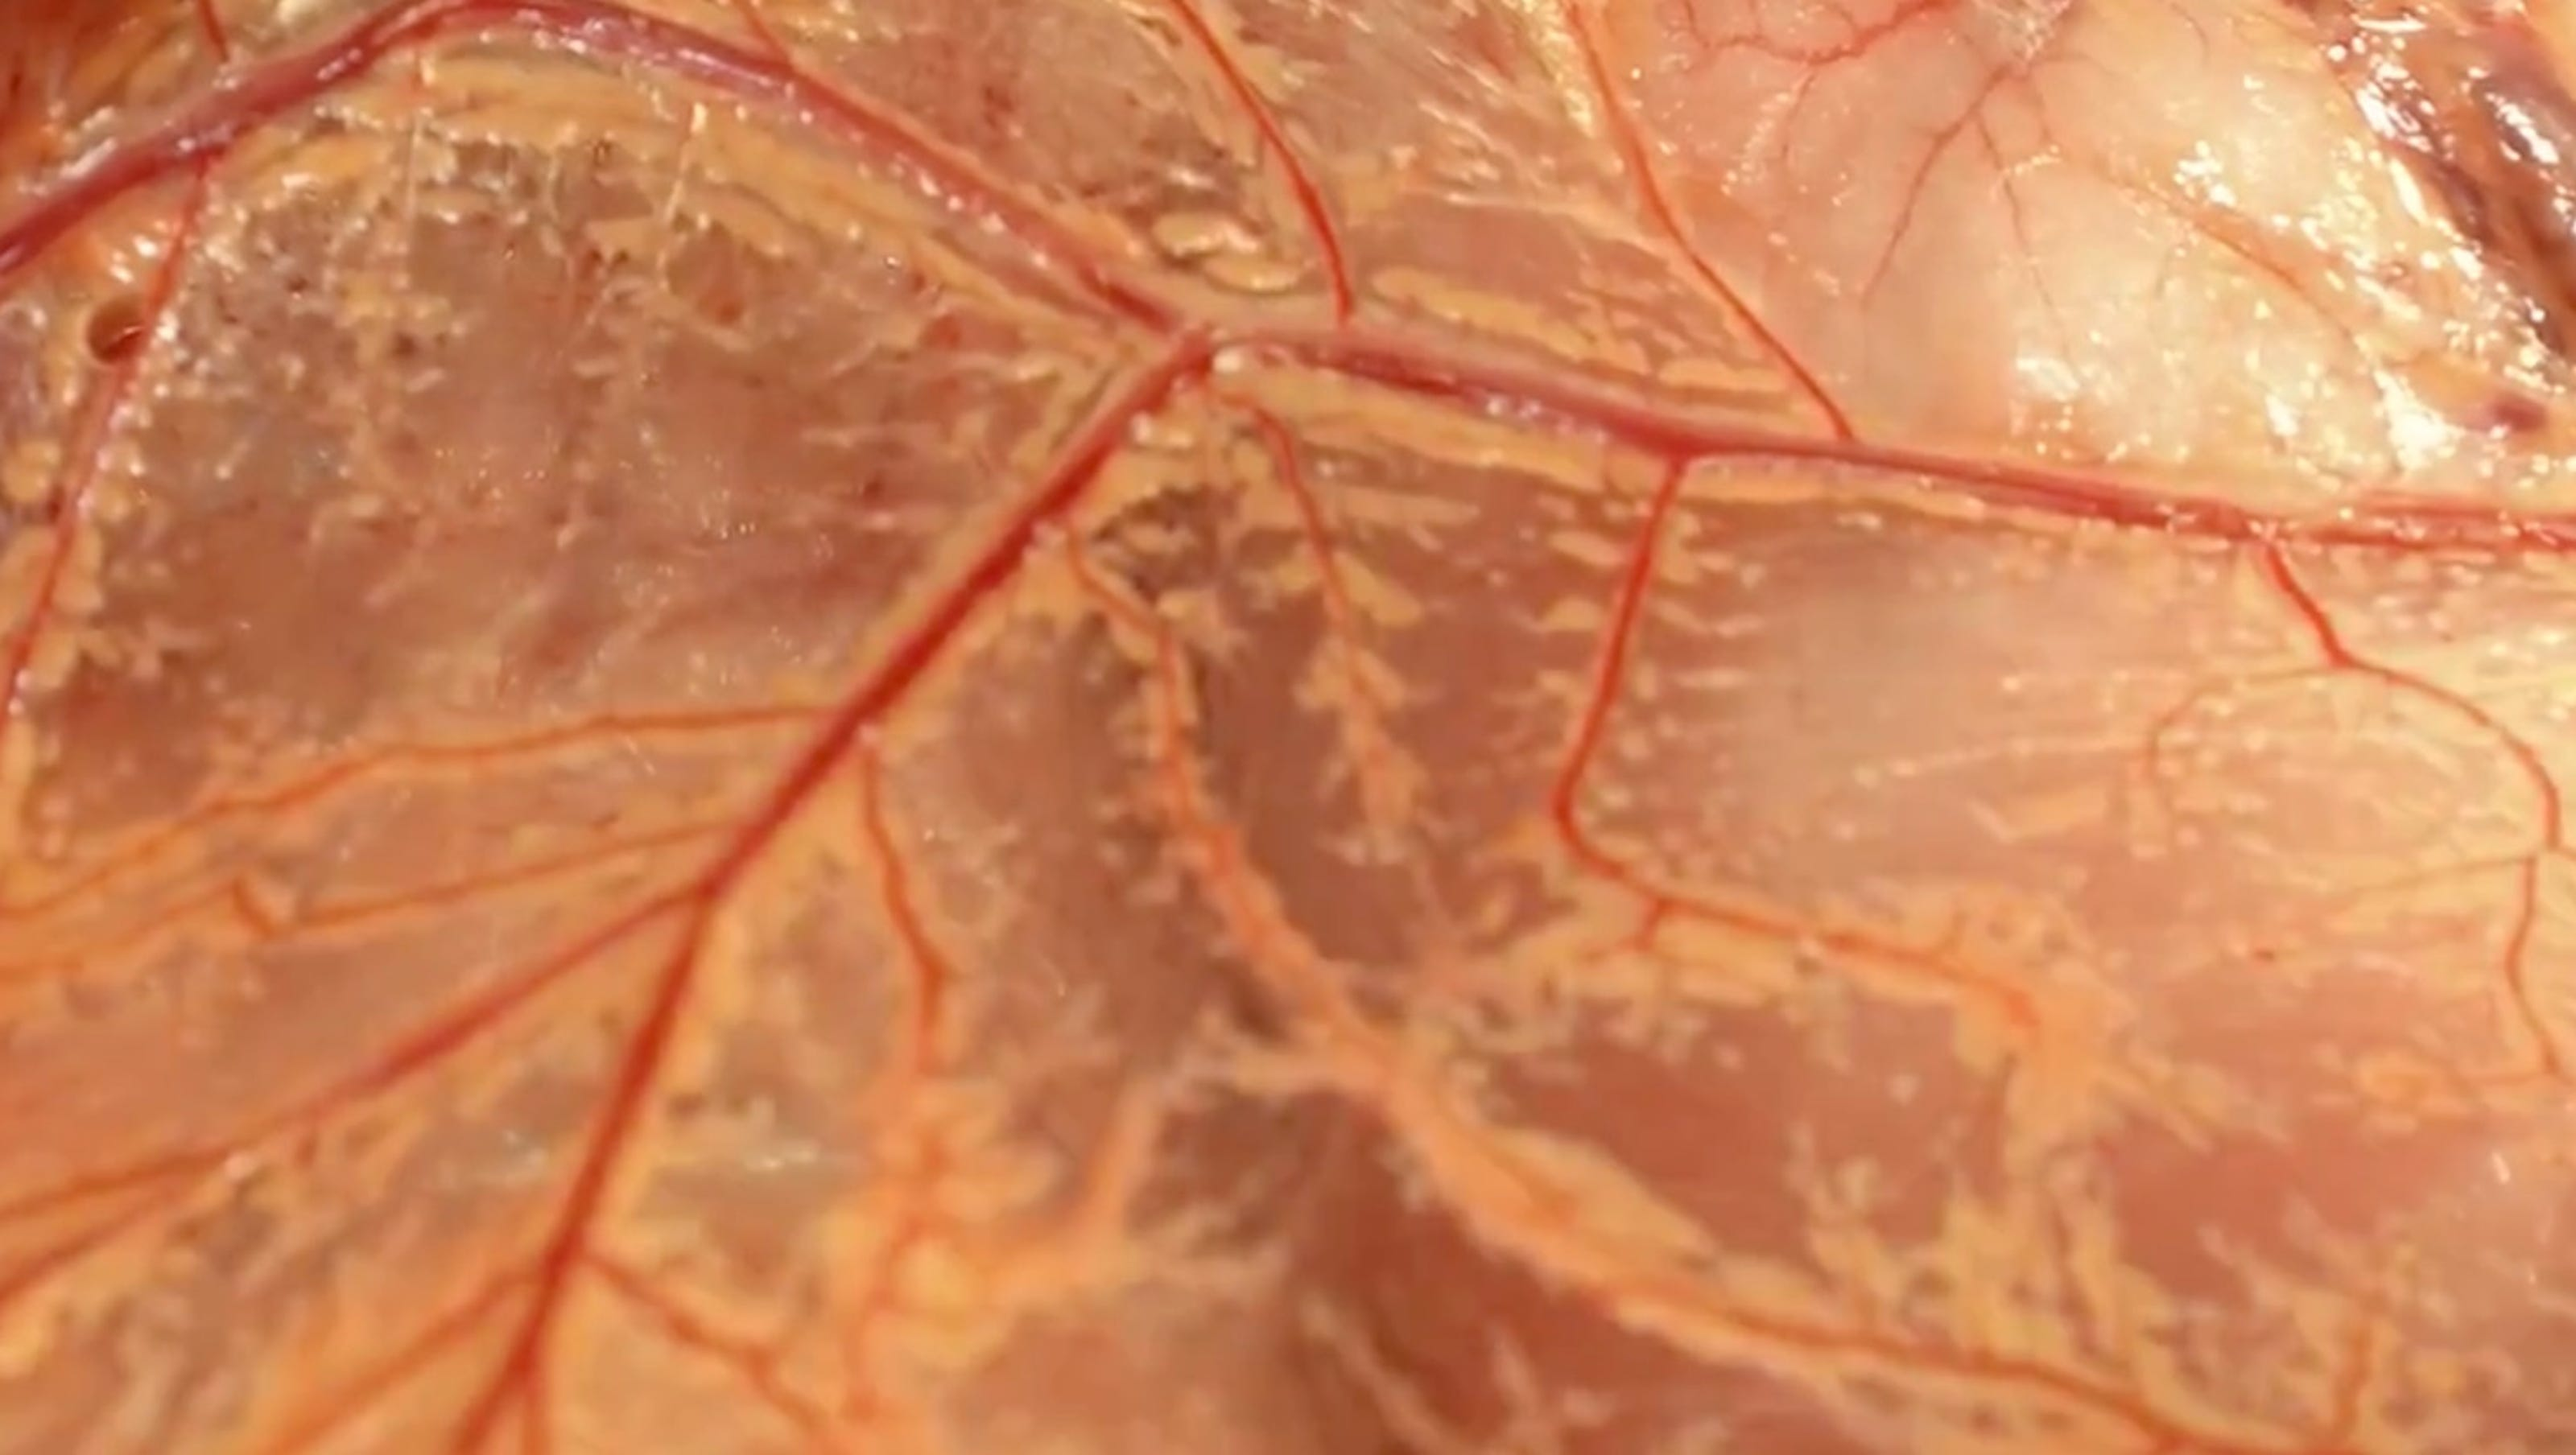 New Human Organ Discovered By Irish Surgeon